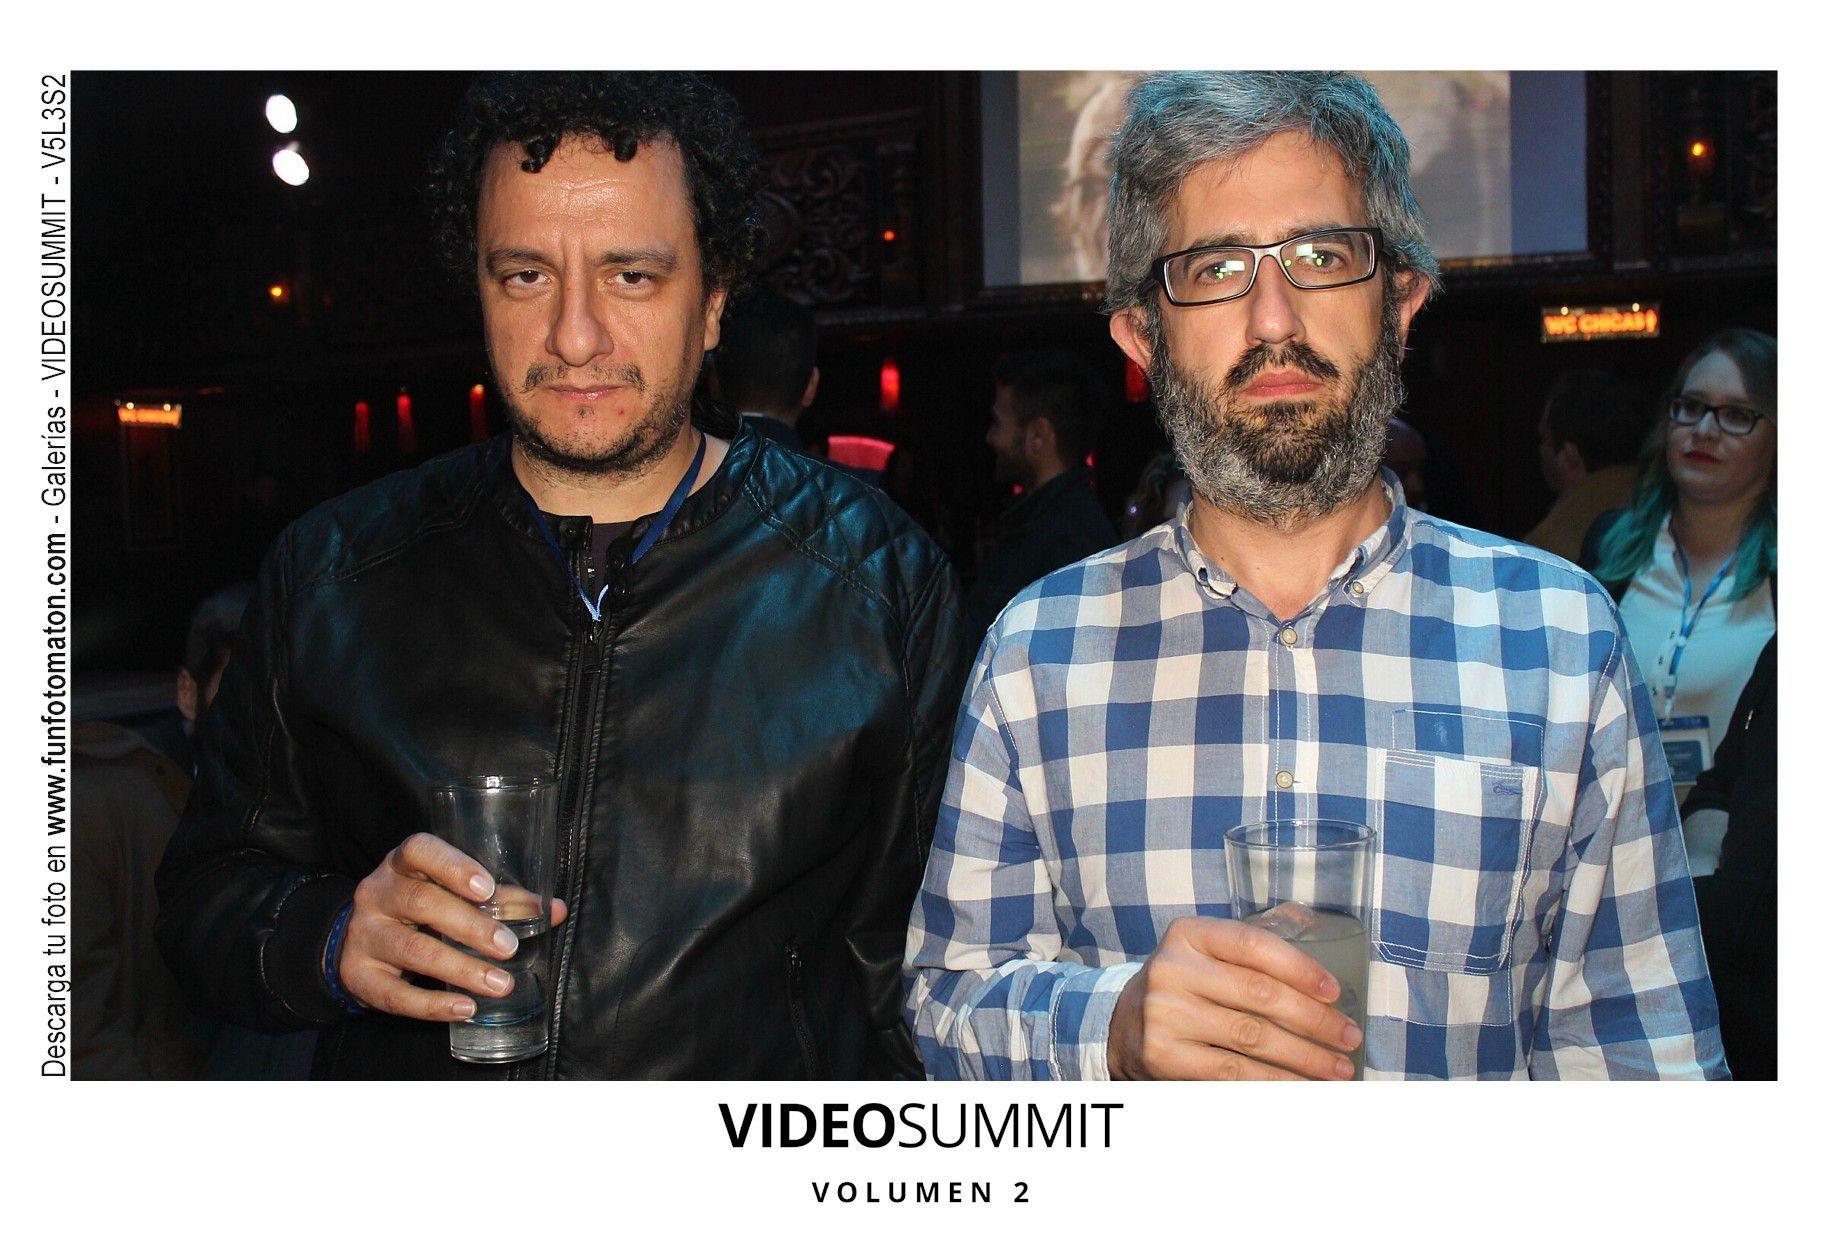 videosummit-vol2-club-party-053